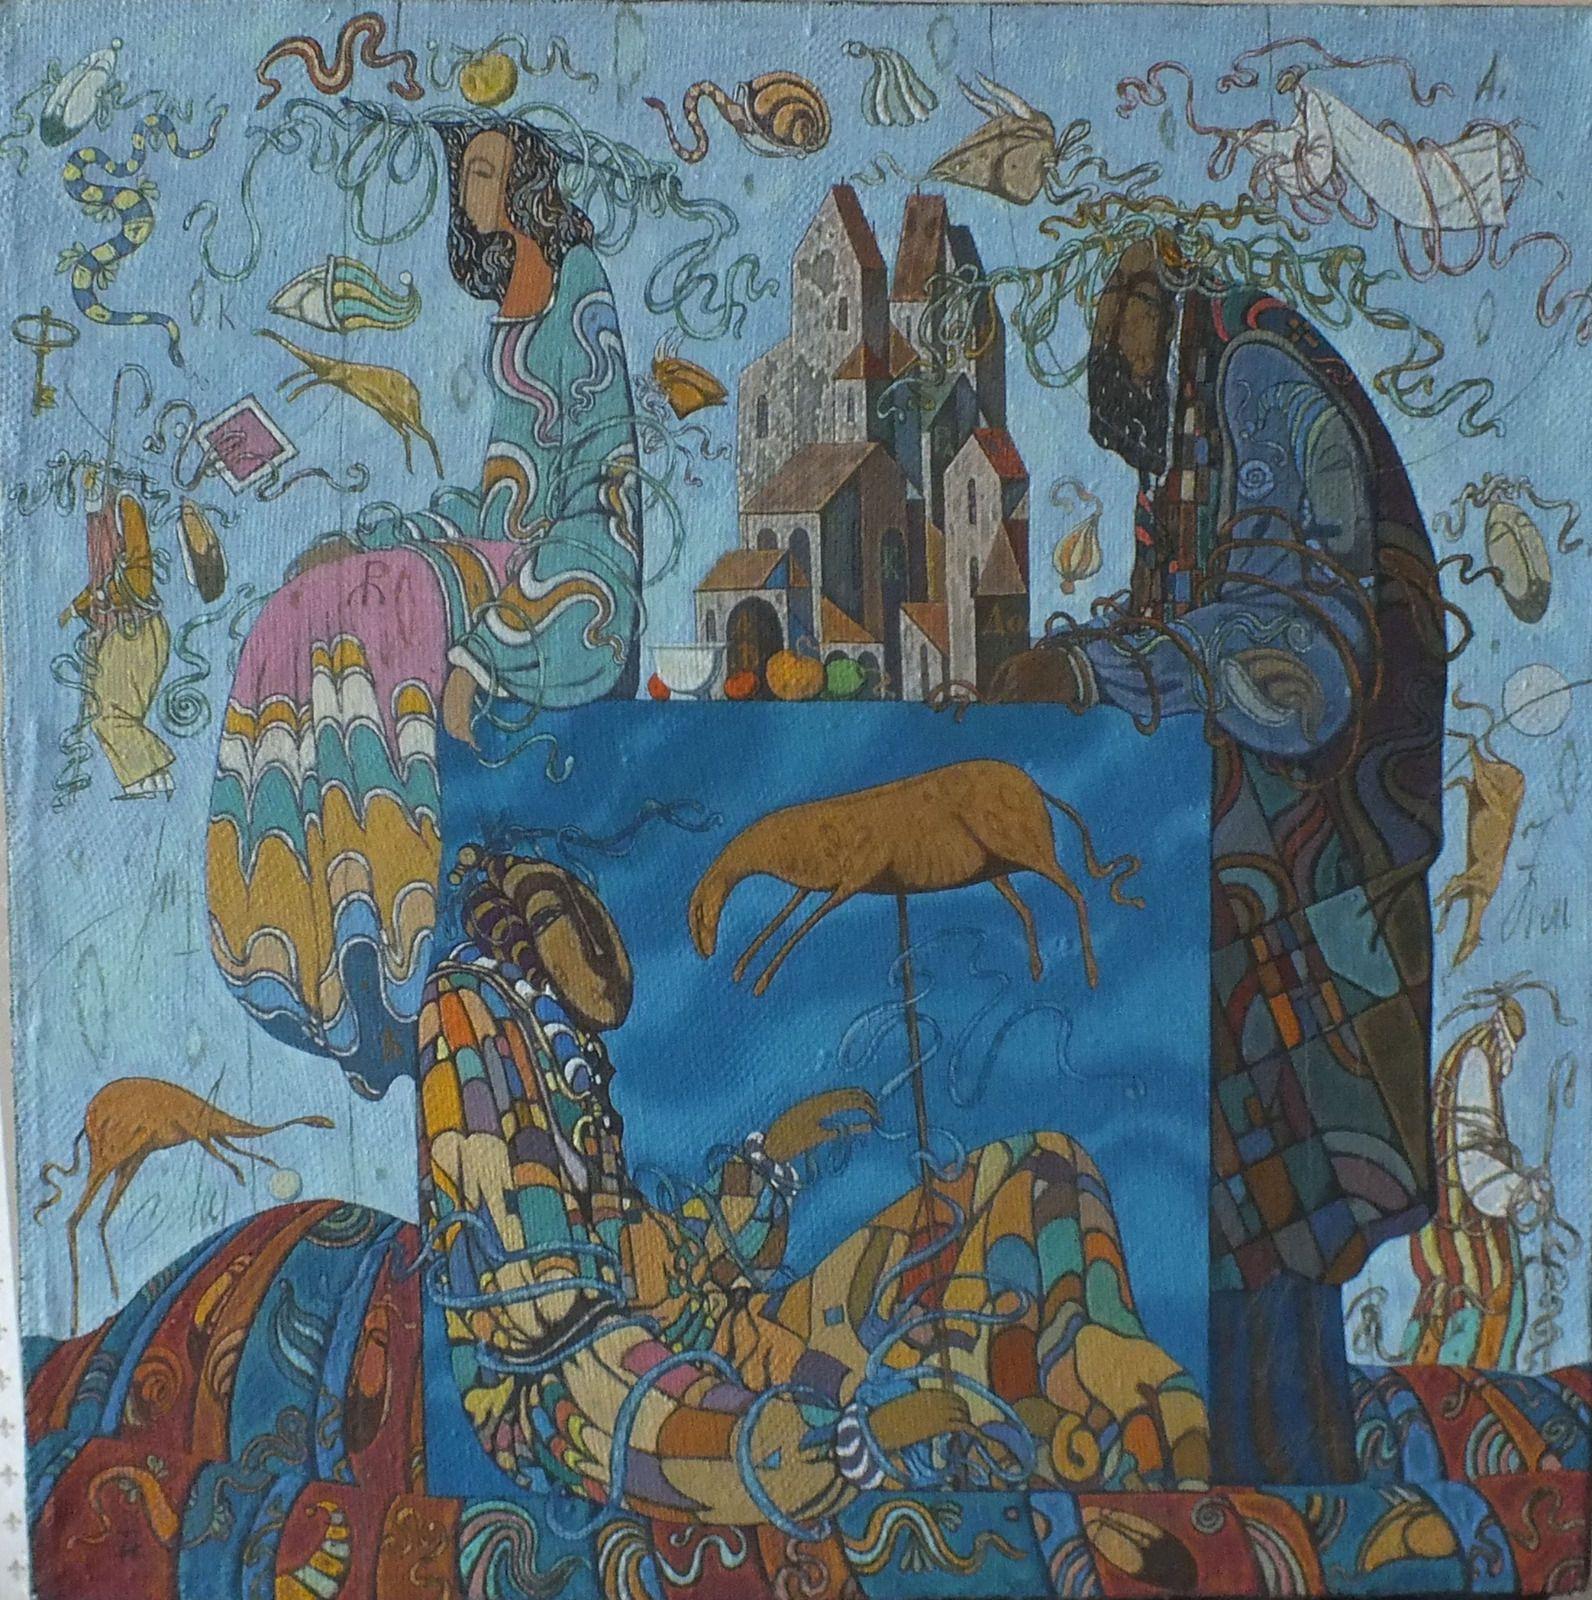 "Ölgemälde Ölbild Leinwand Surrealismus signiert Igor Topilin,,Die Schwermut""   eBay"